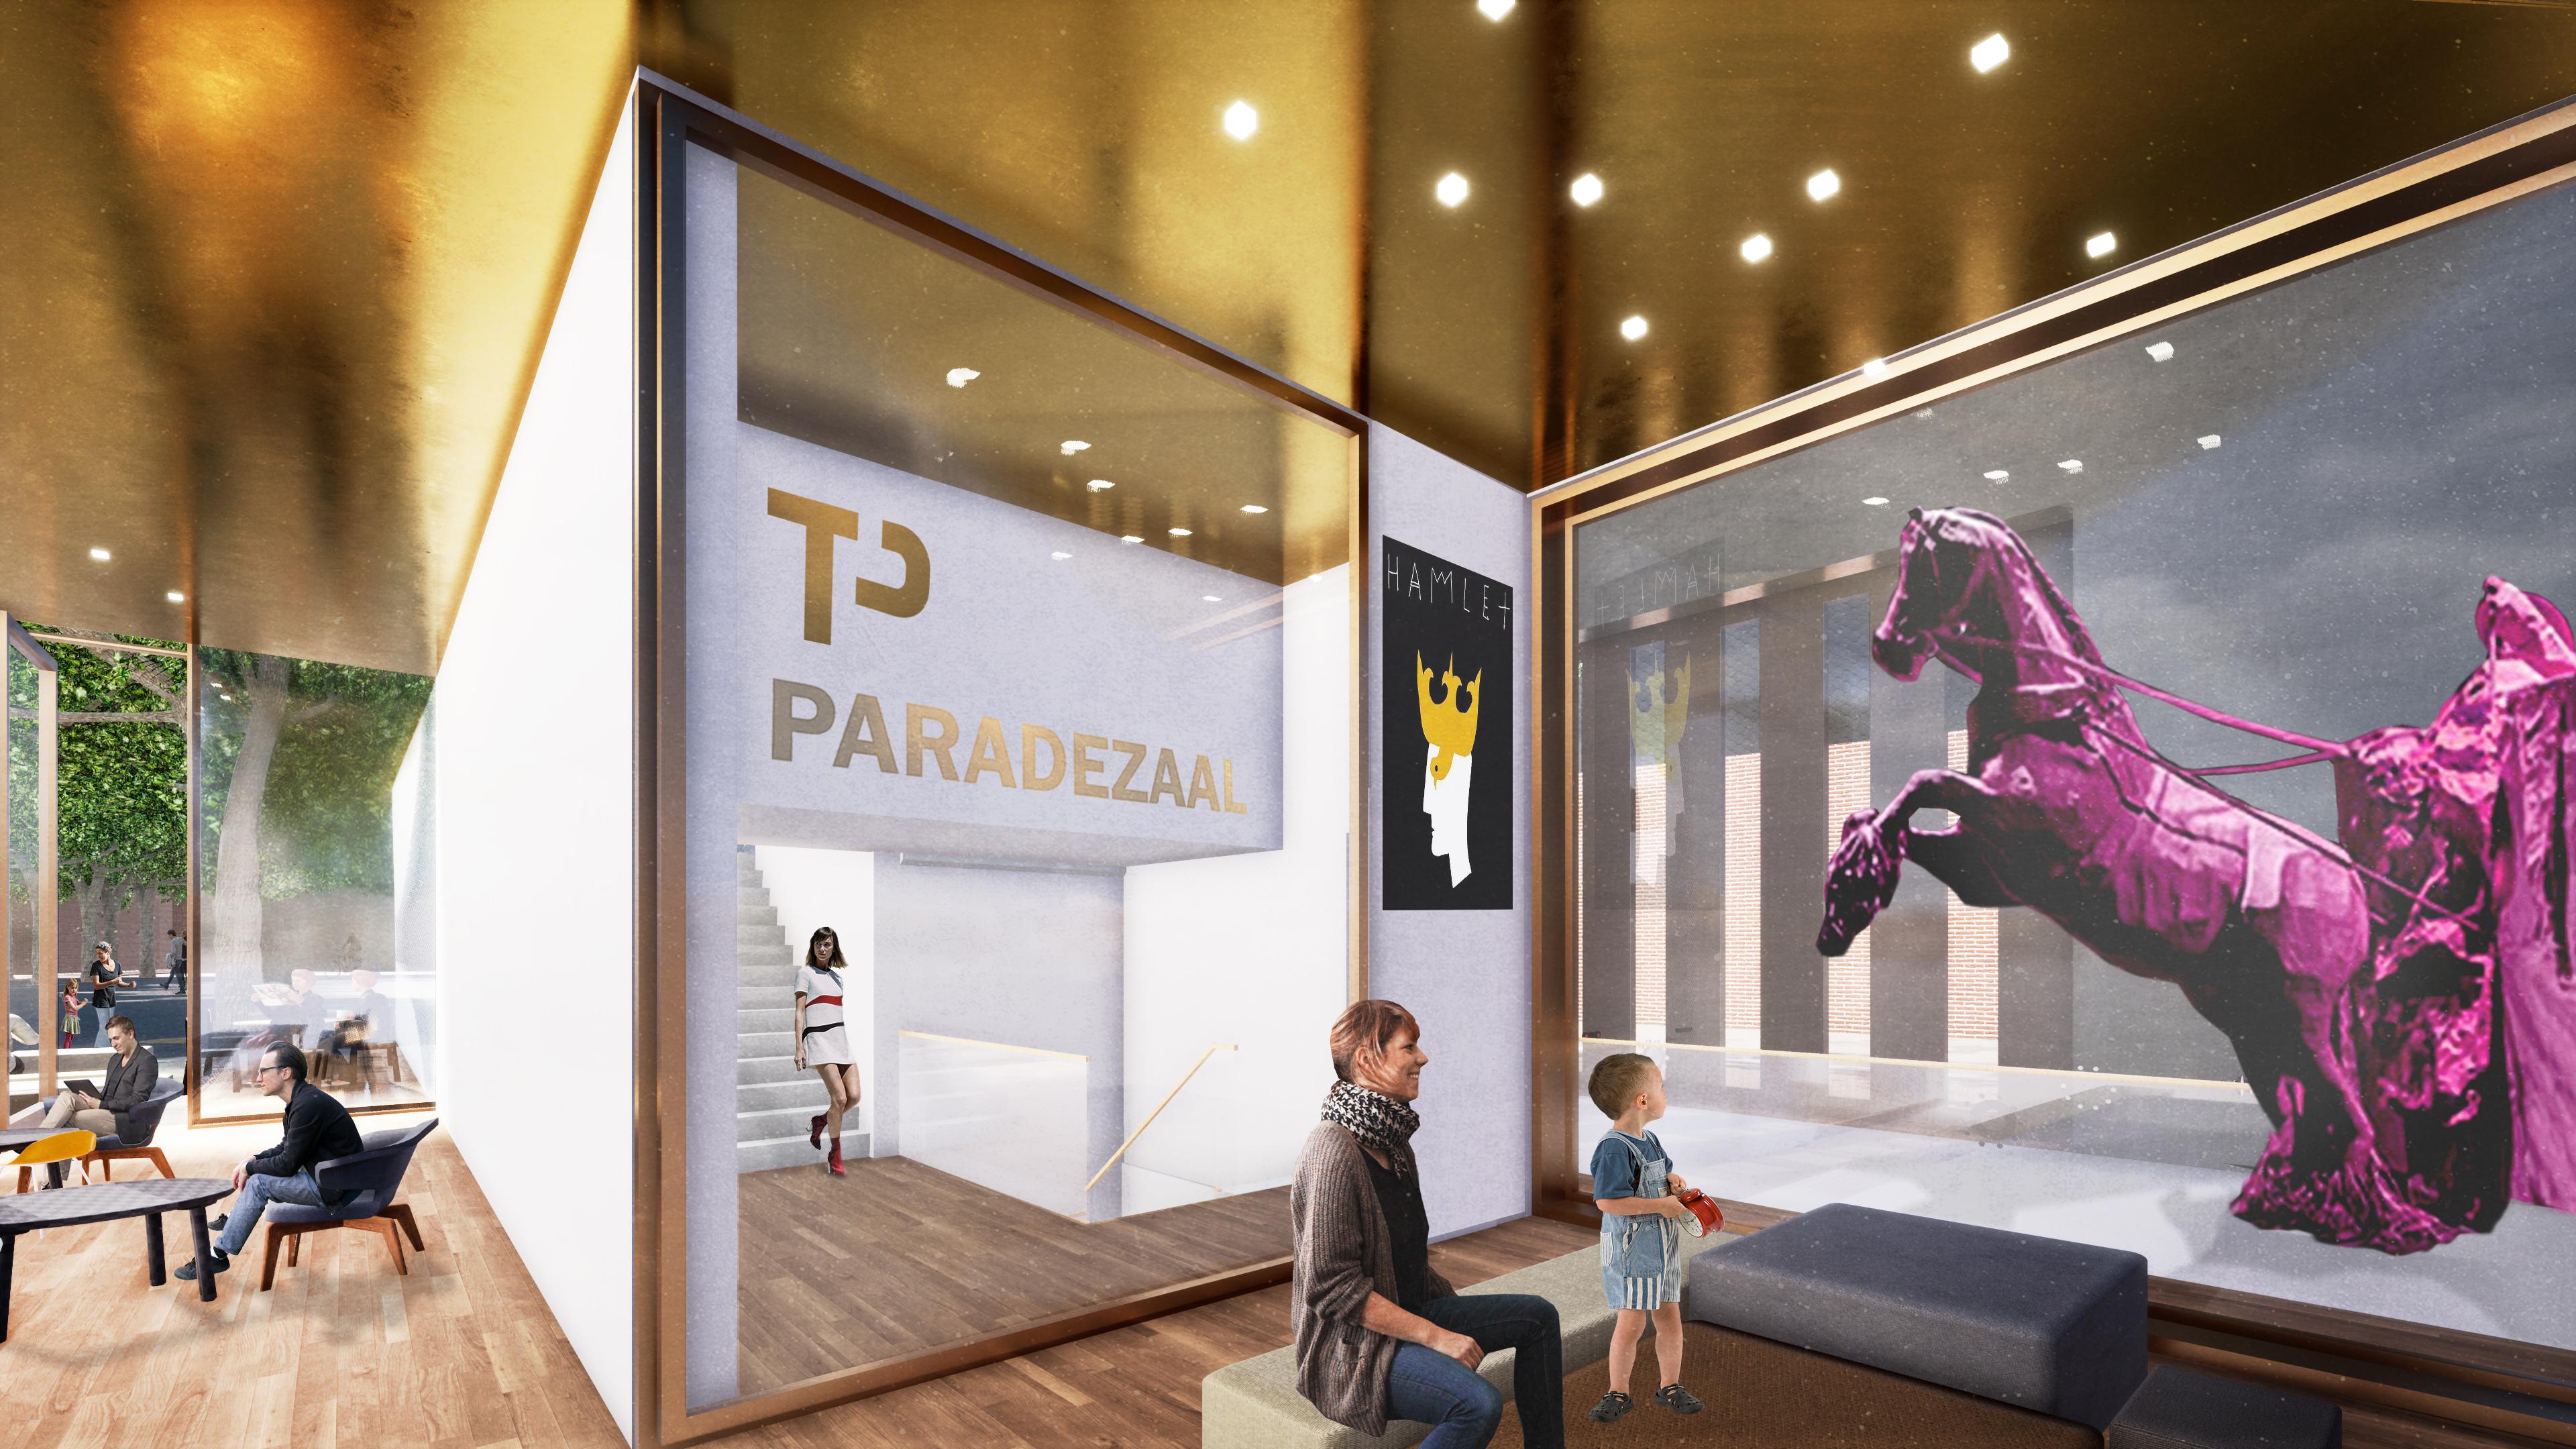 <p>Interieur theatercafe lounge. Theater aan de Parade door NOAHH | Network Oriented Architecture</p>